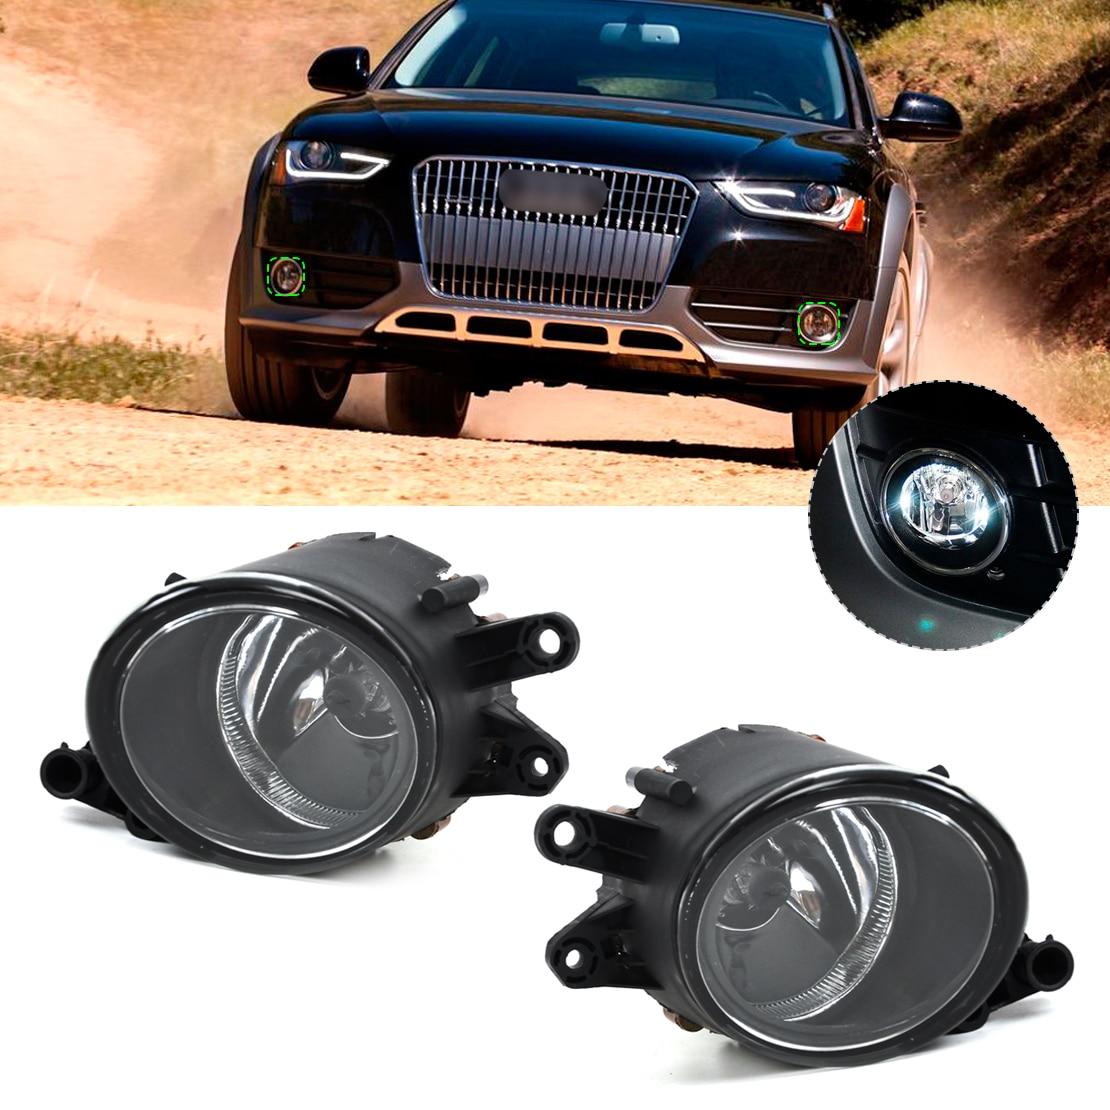 ФОТО DWCX 8E0941700B, 8E0941699B Left + Right Fog Light Lamp for Audi A4 B6/A4 B7/A4 Quattro 2001 2002 2003 2004 2005 2006 2007 2008